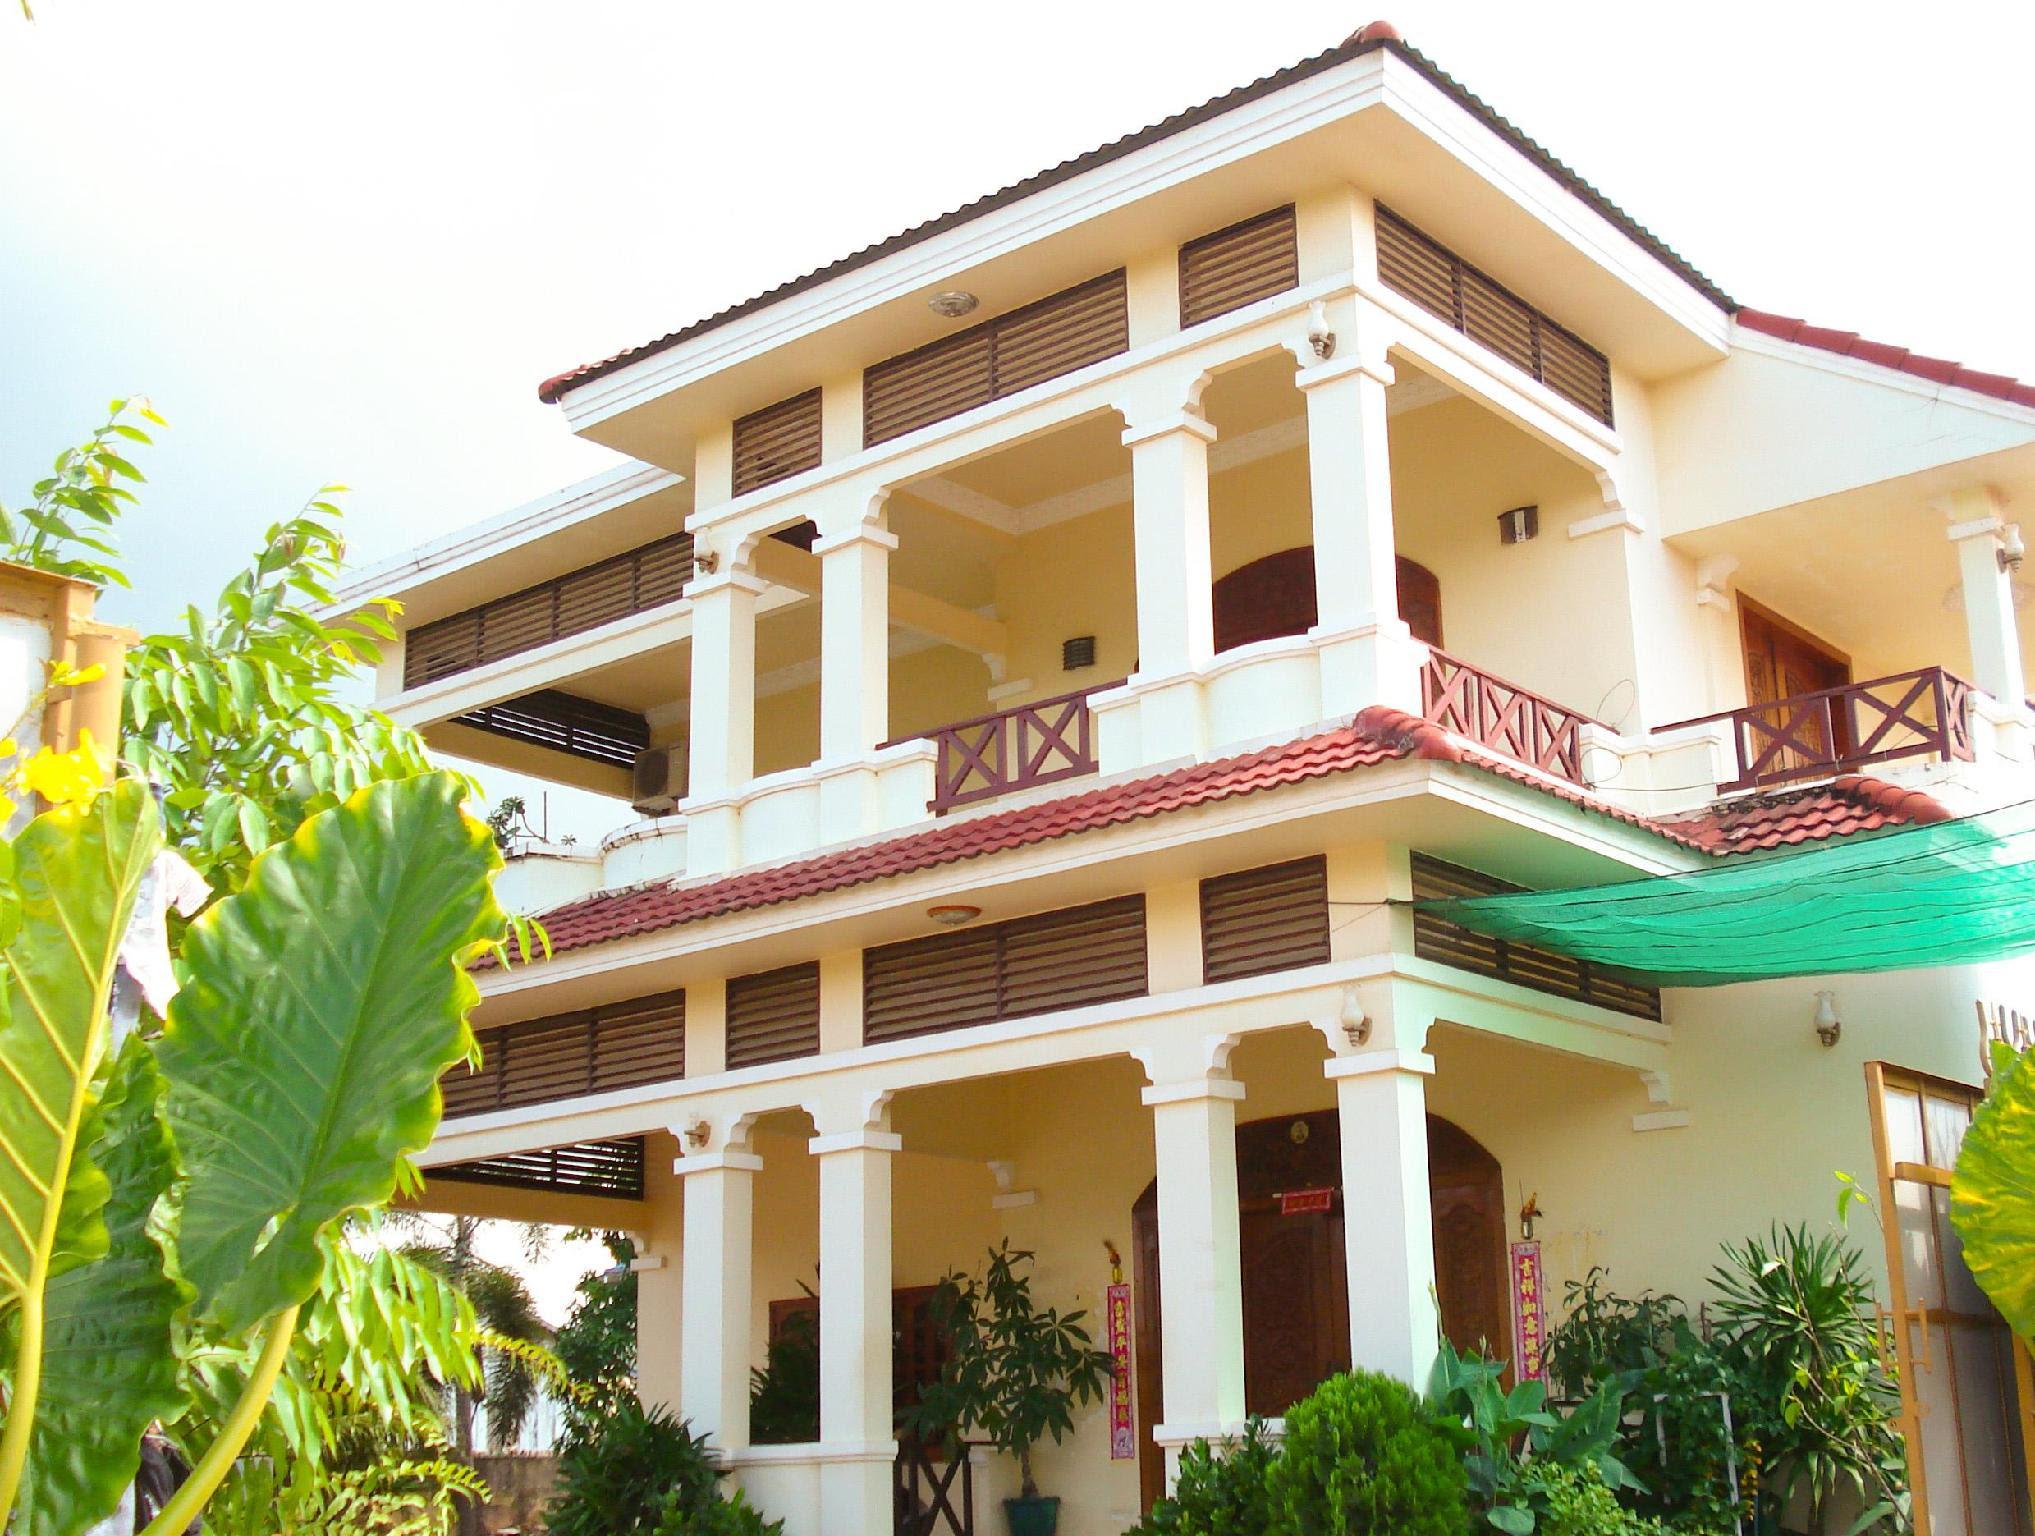 La Belle Villa Reviews